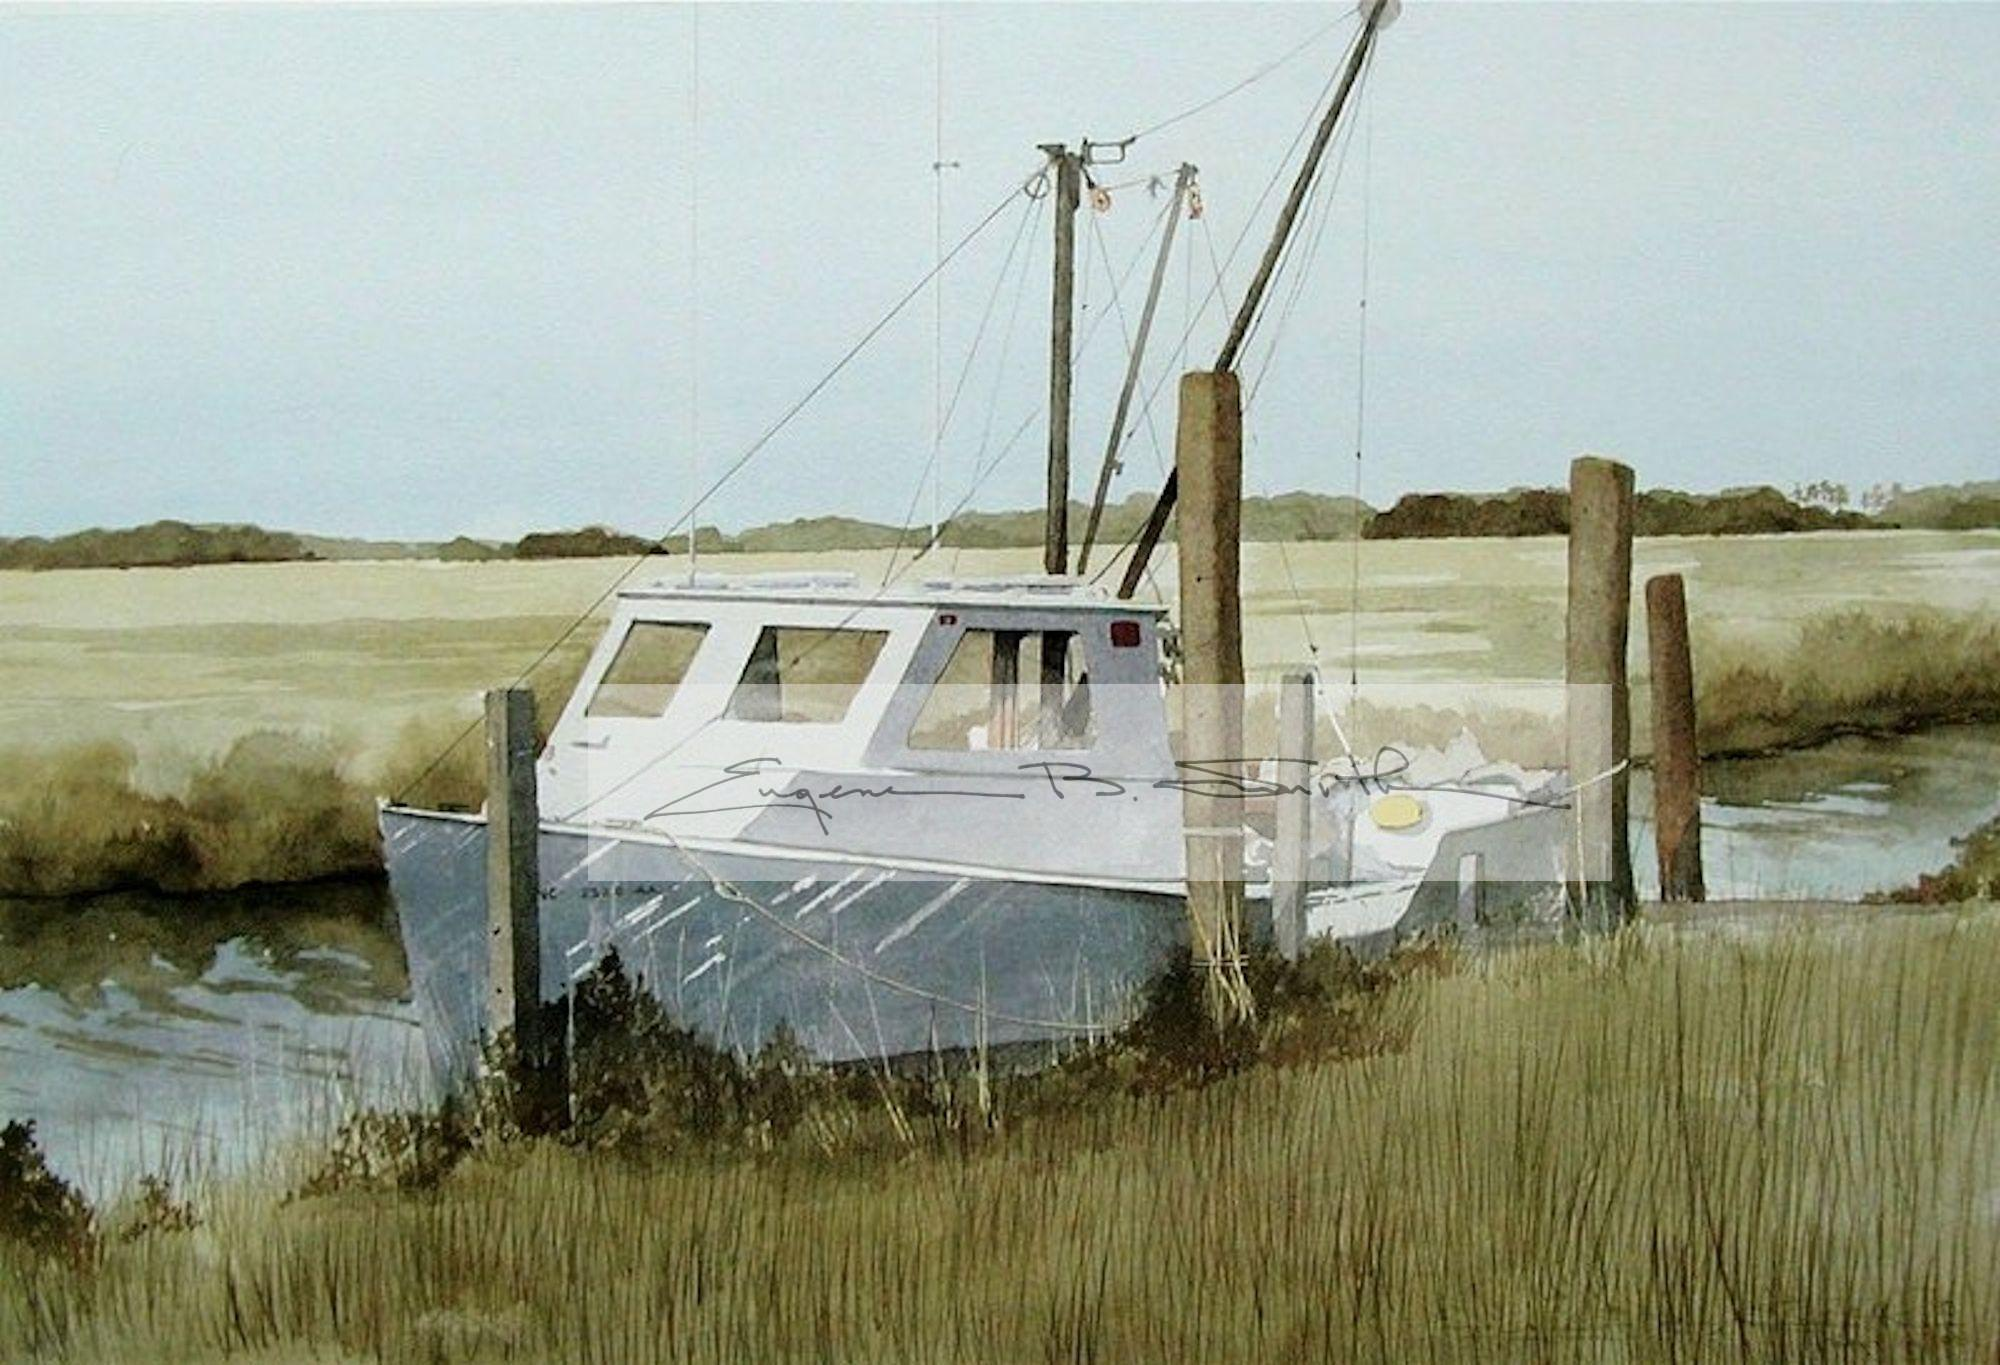 Giclee Print | Image Size: 14.5 x 20.5 | $175 | Frame Size: 24 x 30